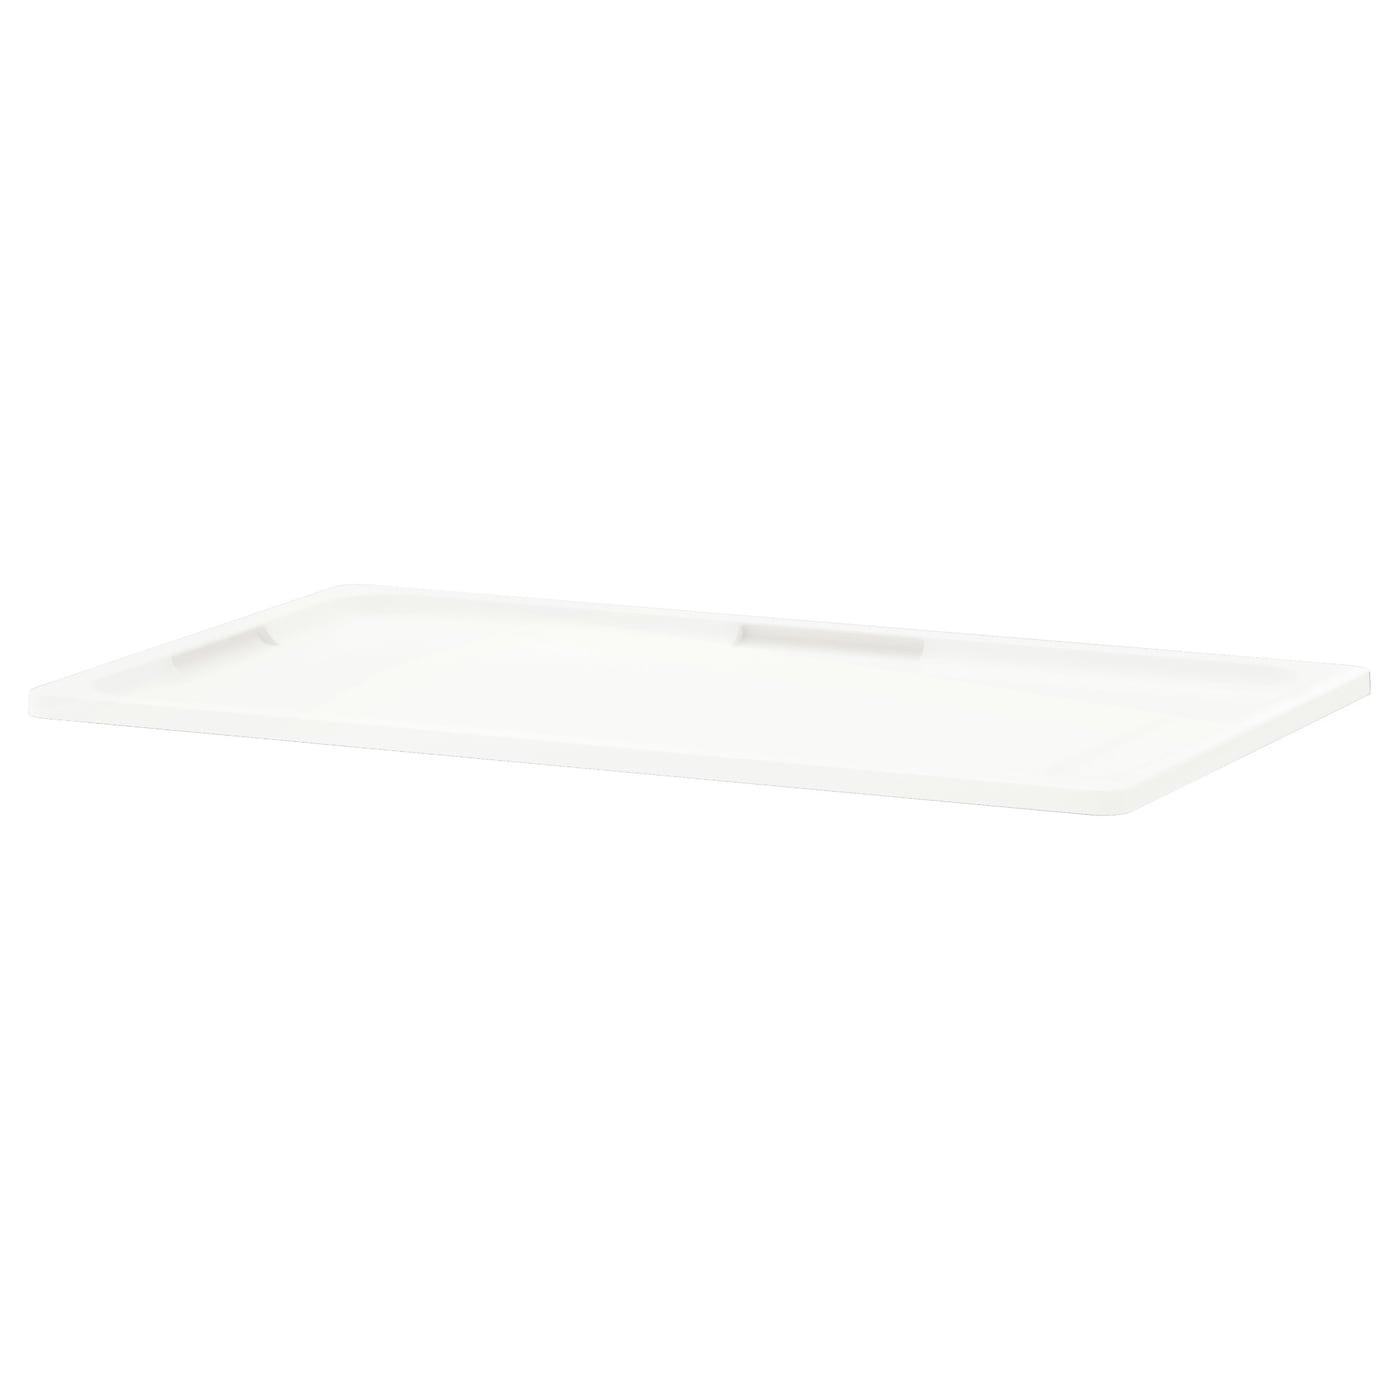 Ikea Hosenbügel komplement aufhänger ikea